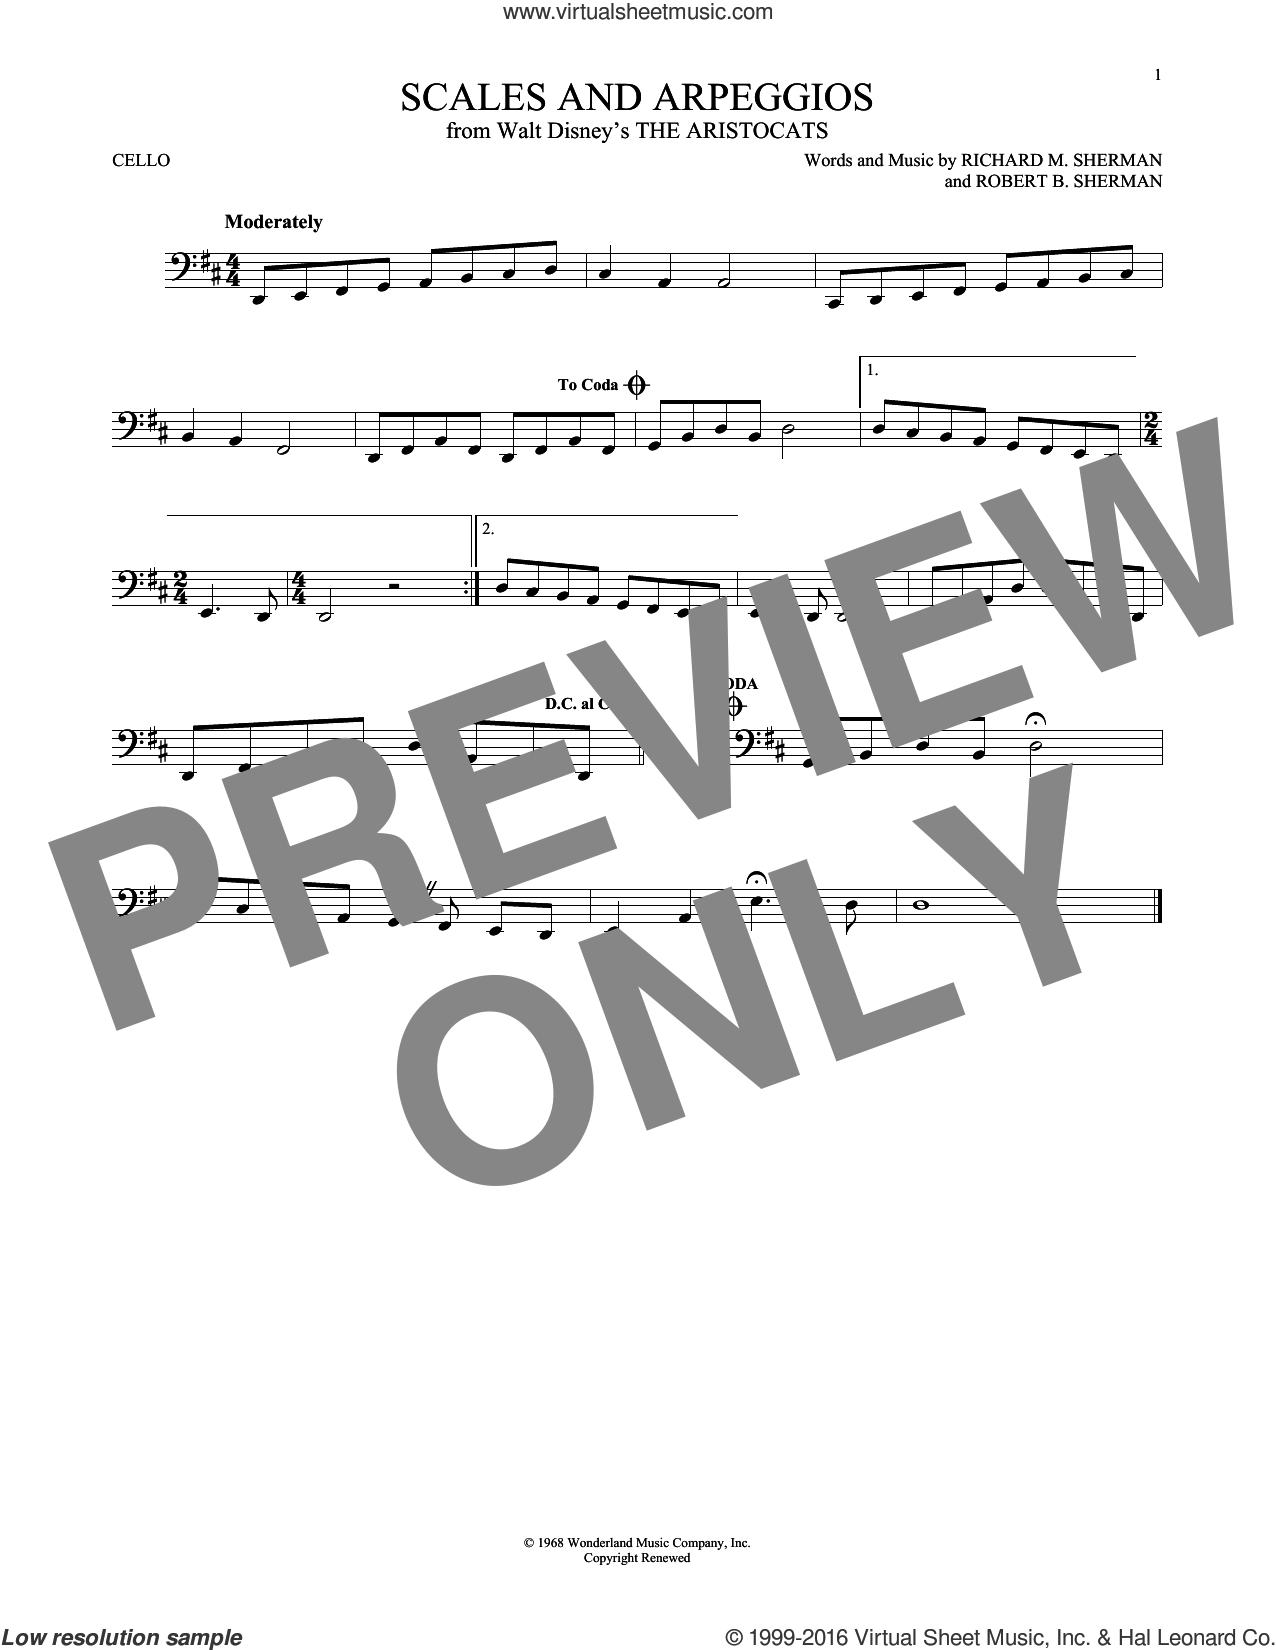 Scales And Arpeggios sheet music for cello solo by Richard M. Sherman, Richard & Robert Sherman and Robert B. Sherman, intermediate skill level